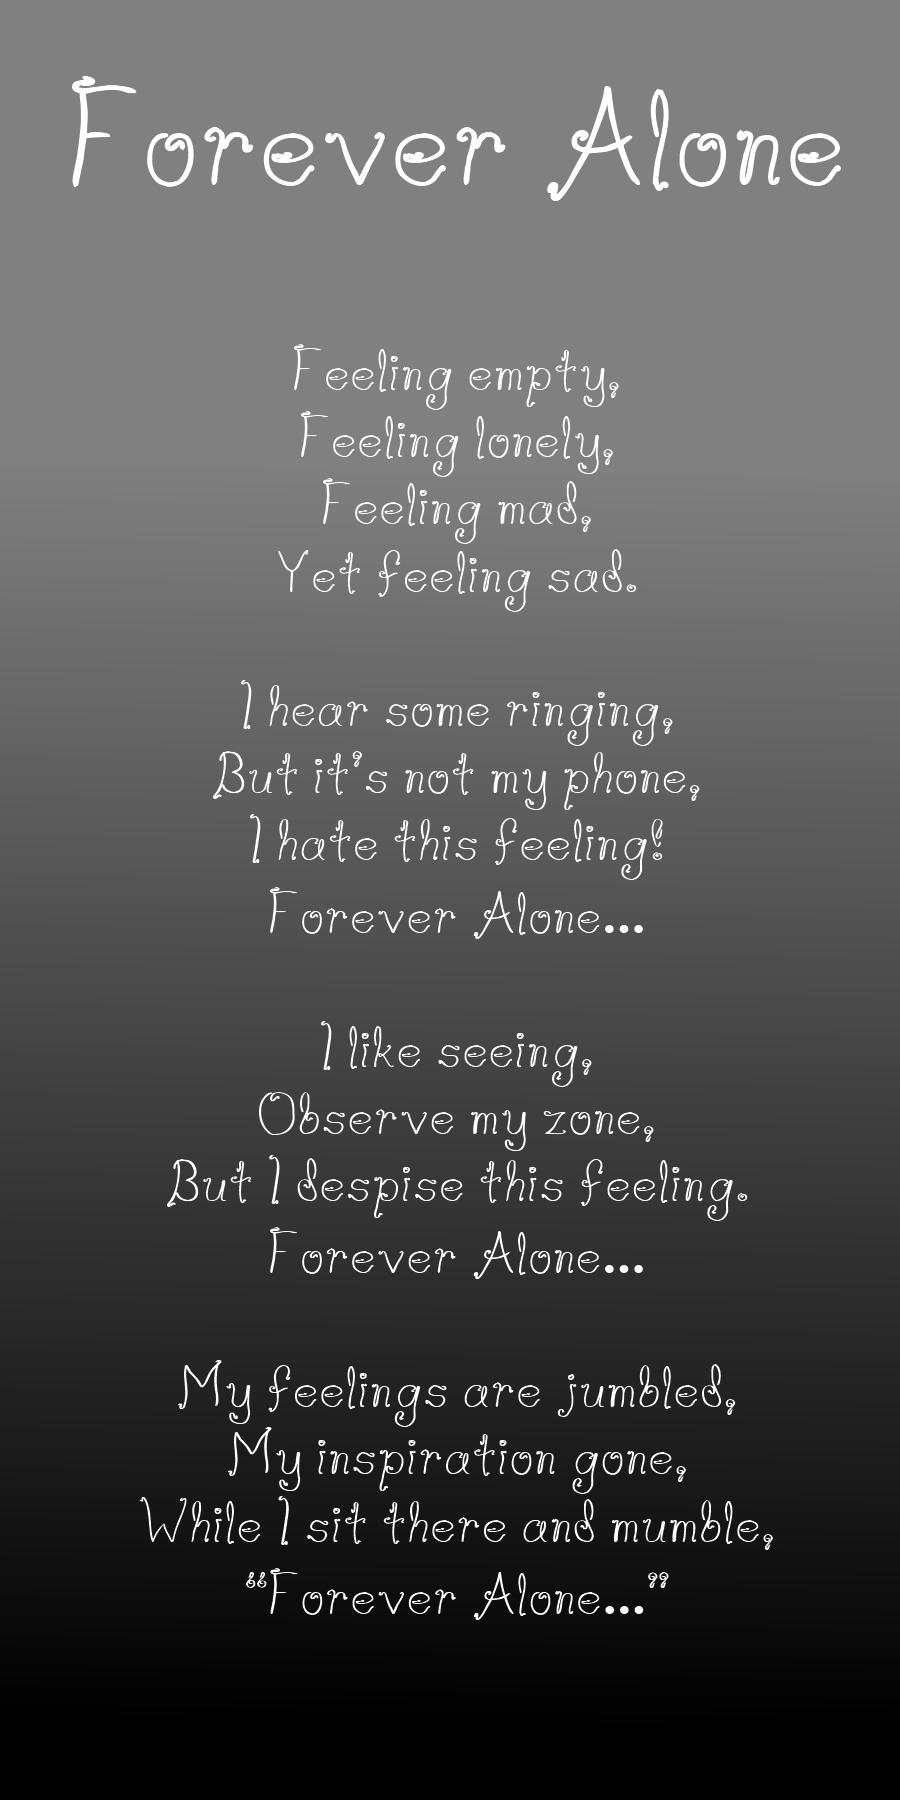 Being Alone Sad Quotes: Forever Alone Sad Quotes. QuotesGram